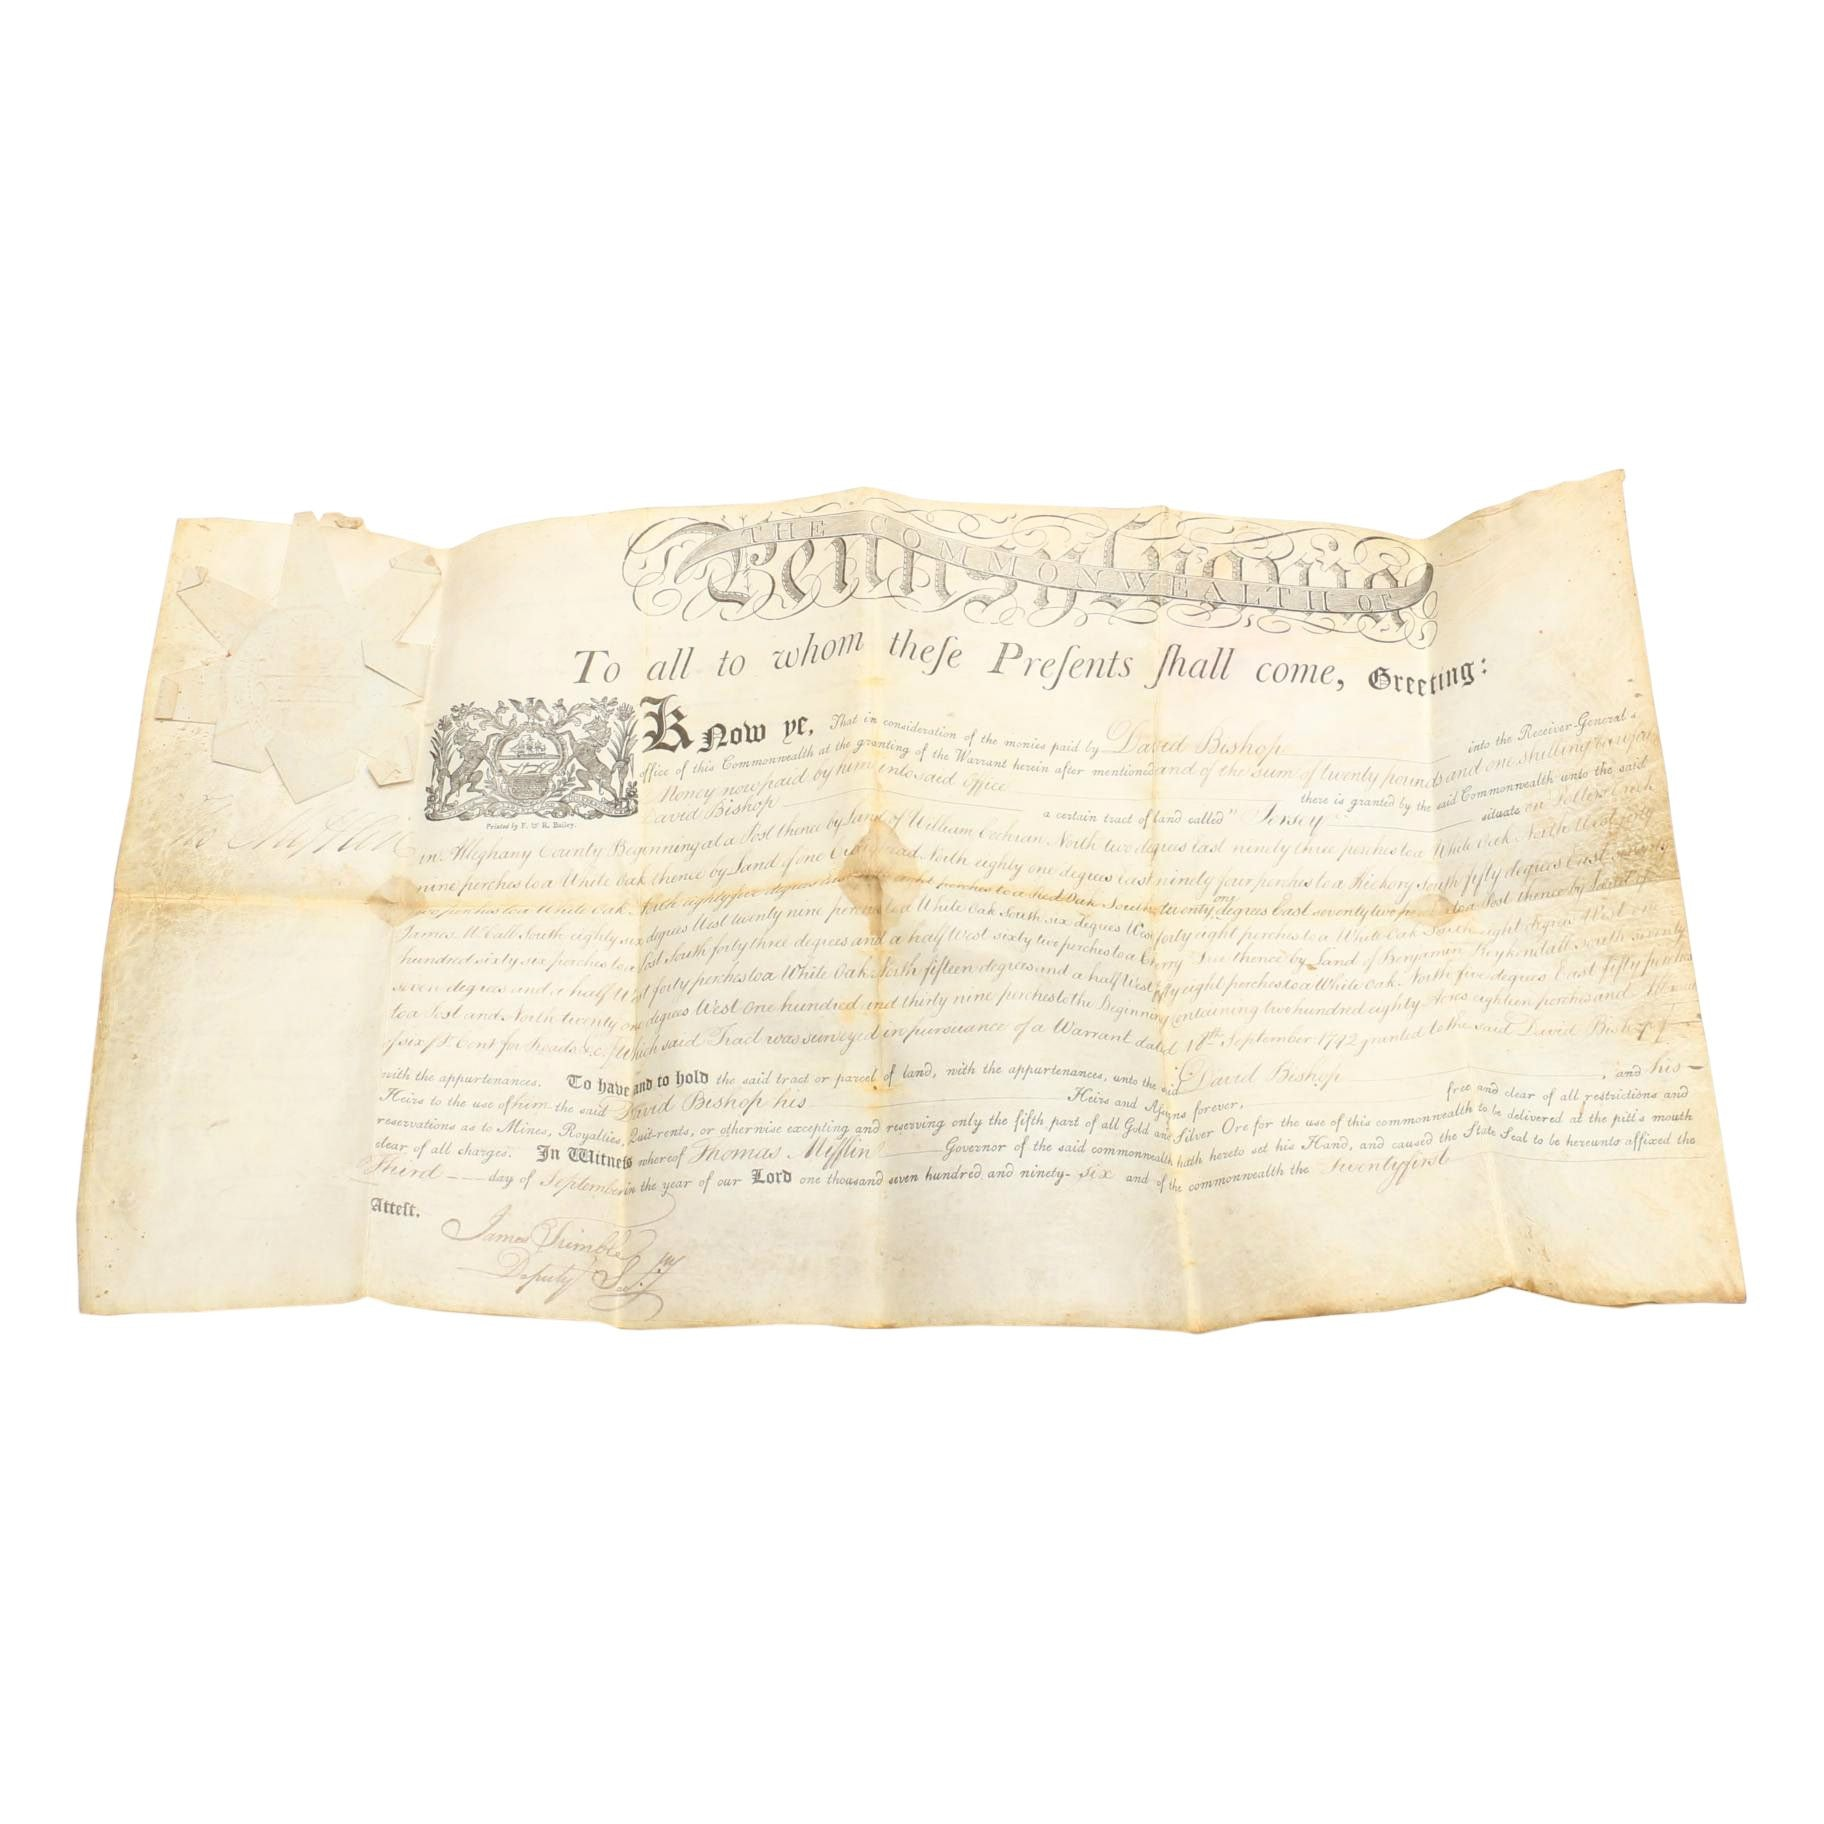 1792 F&R Bailey Print of Allegheny County Land Warrant